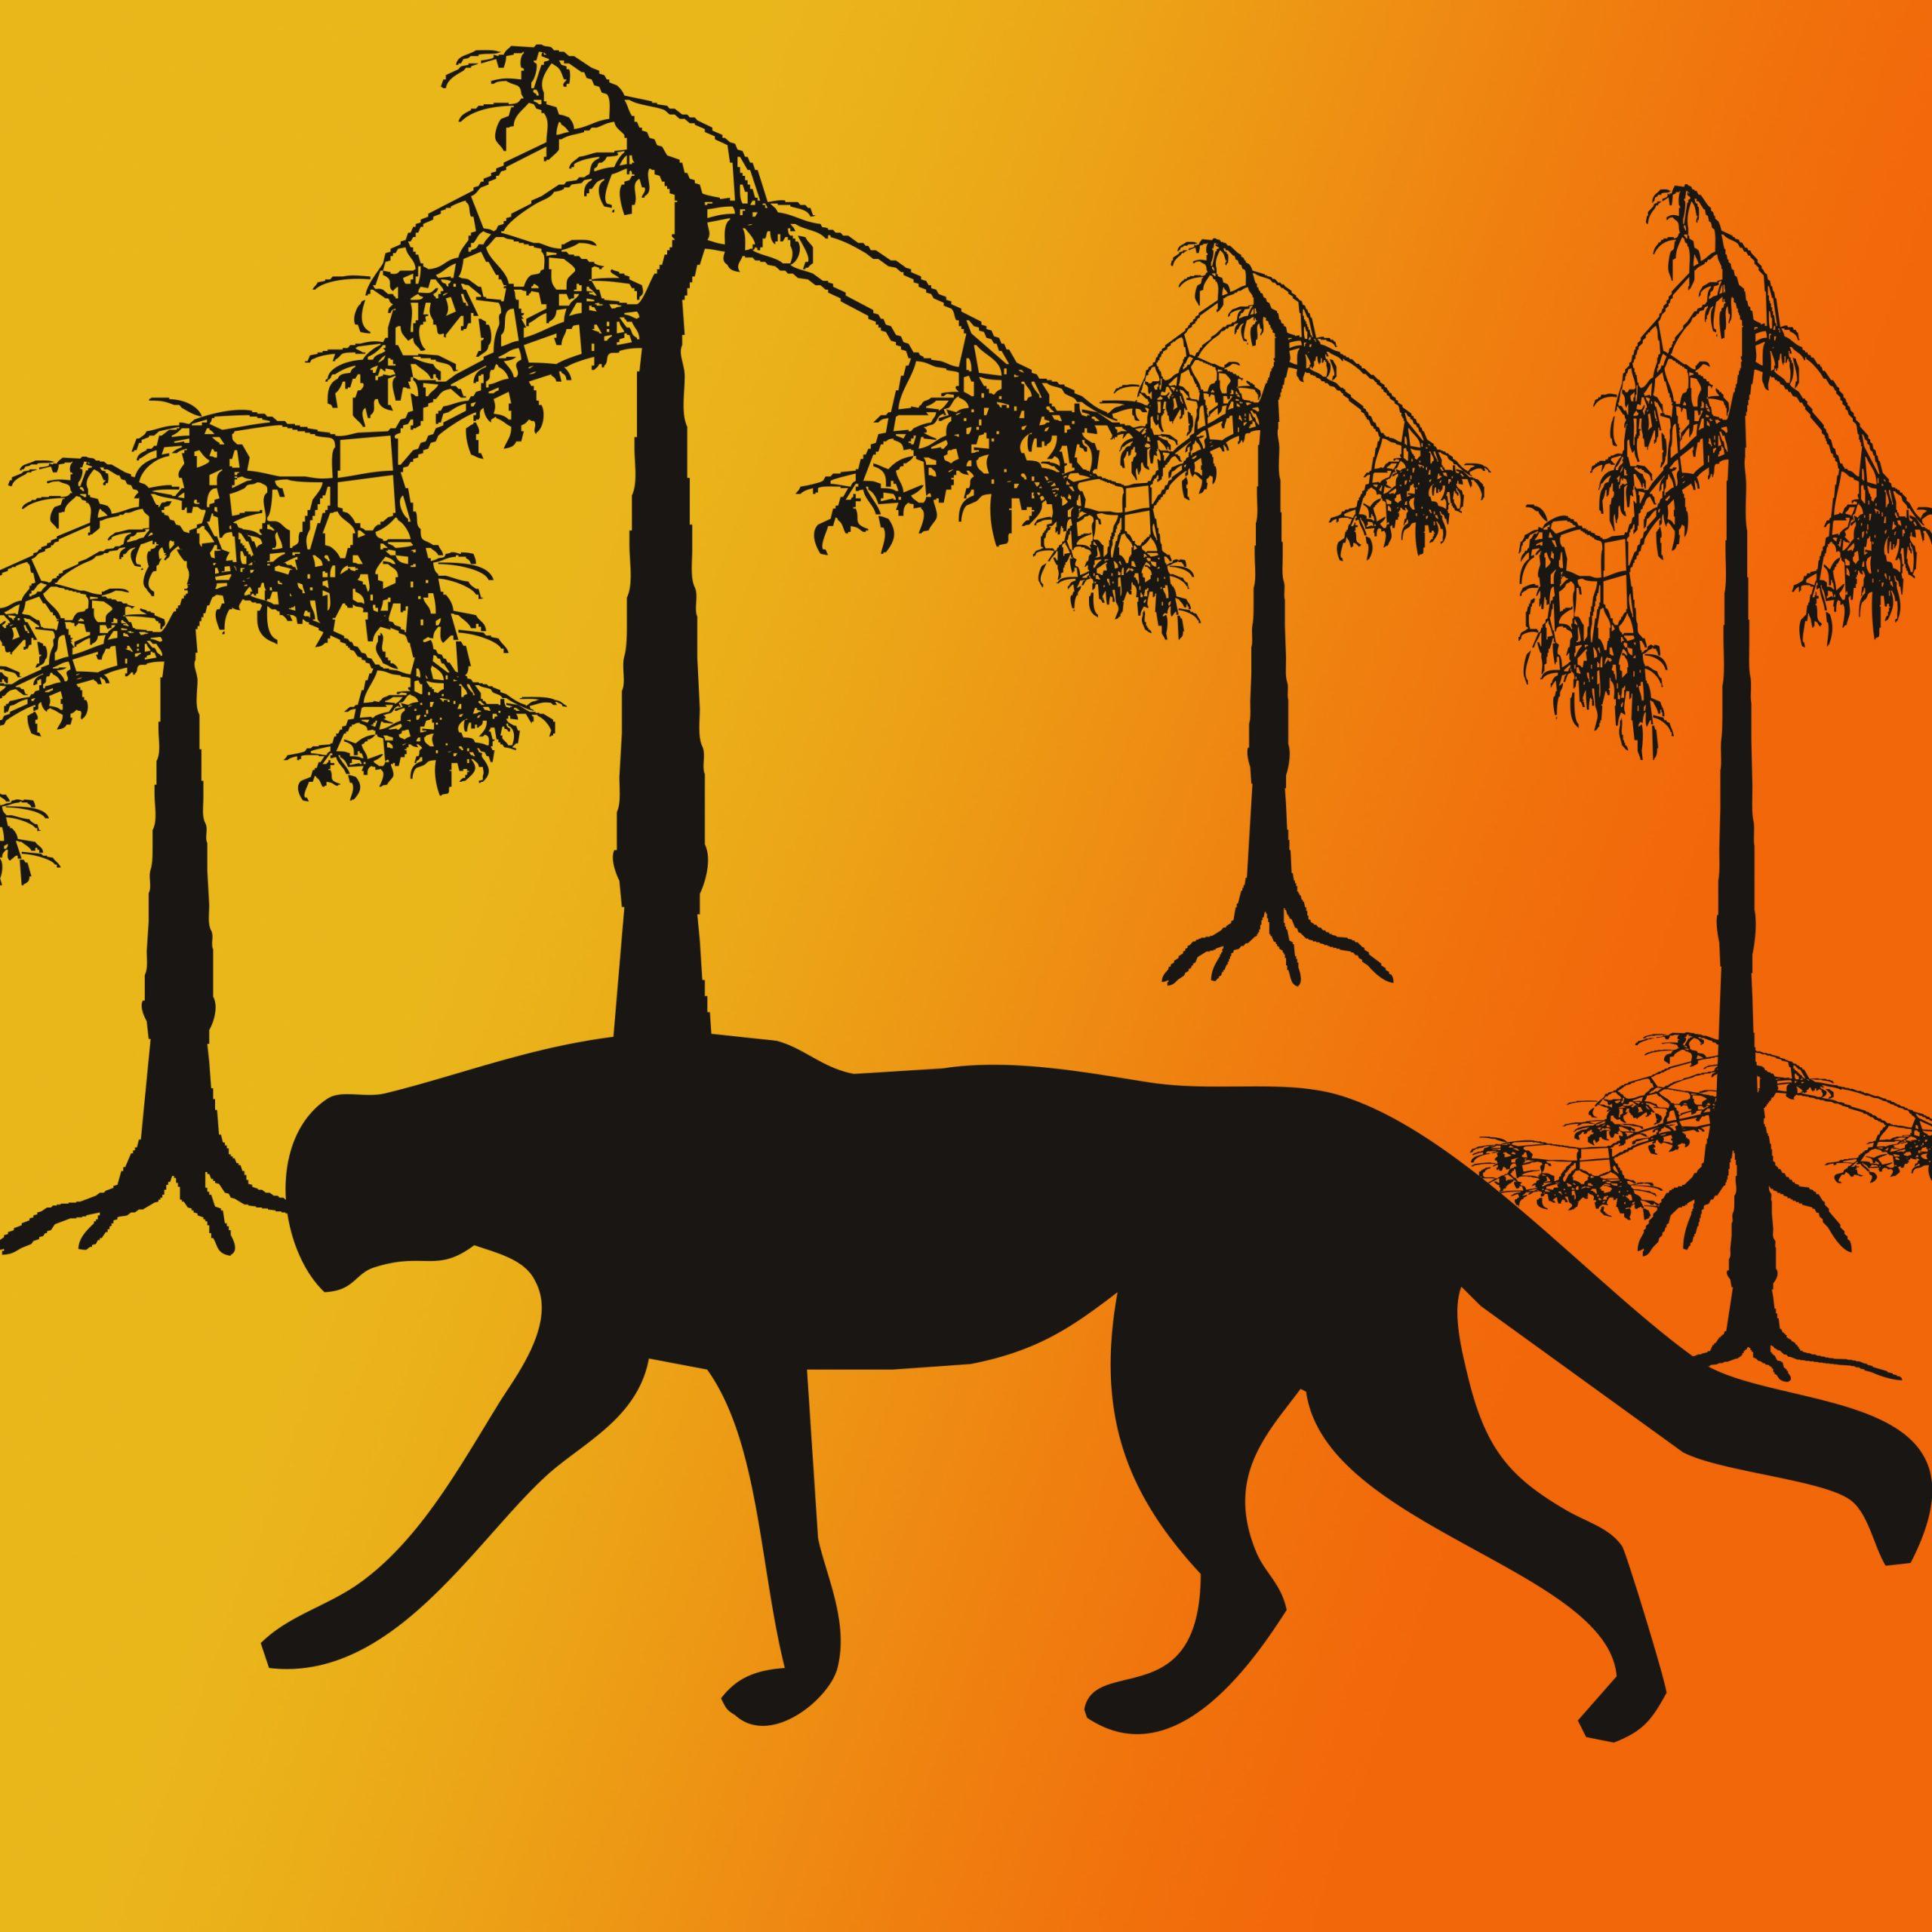 A leopard illustration